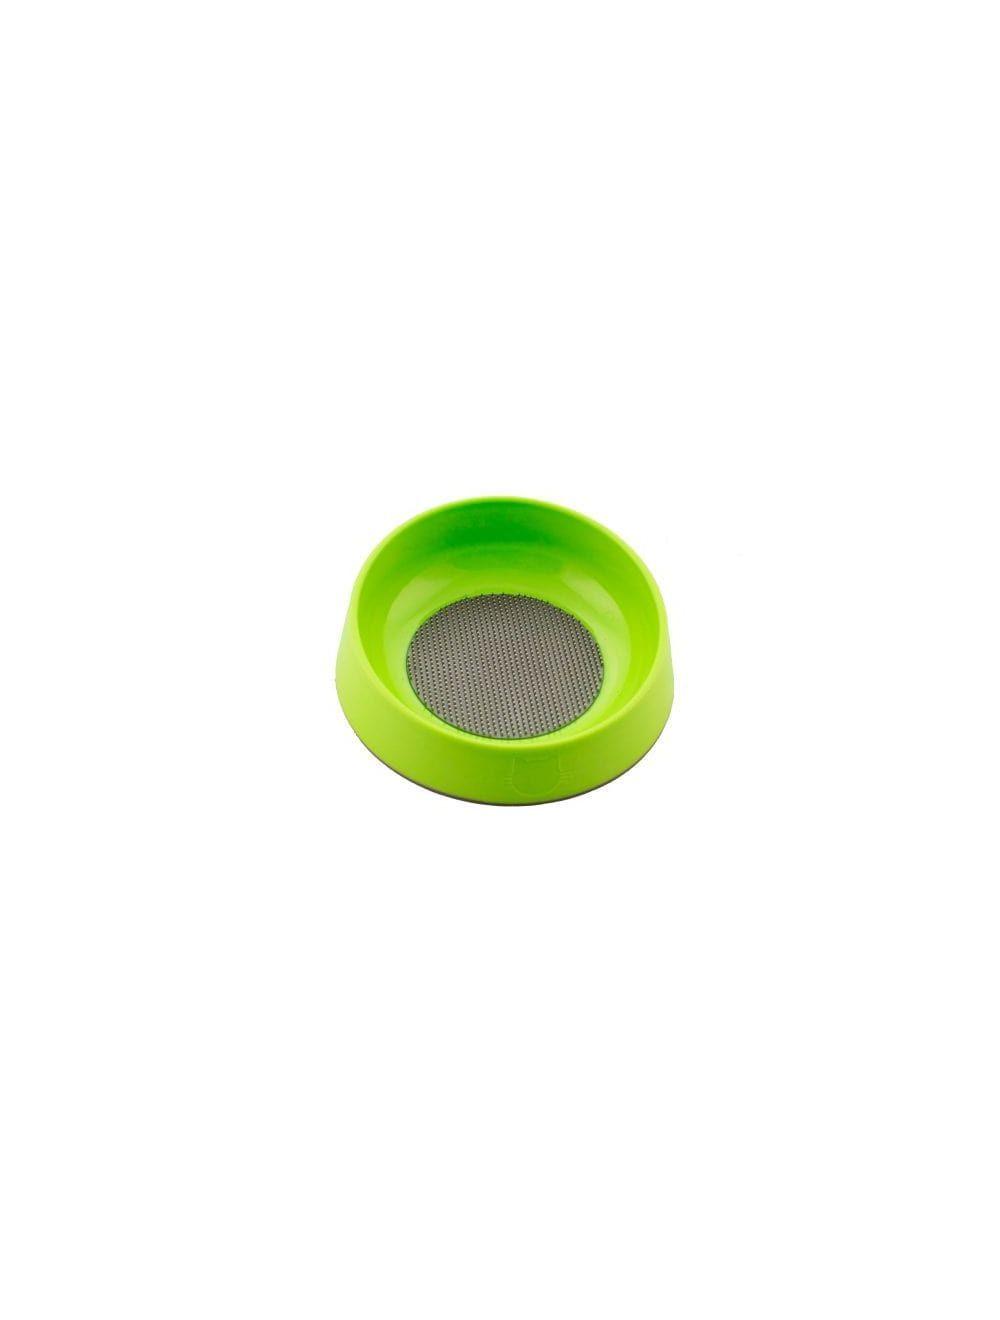 Hyper pet OHBowl verde pequeño